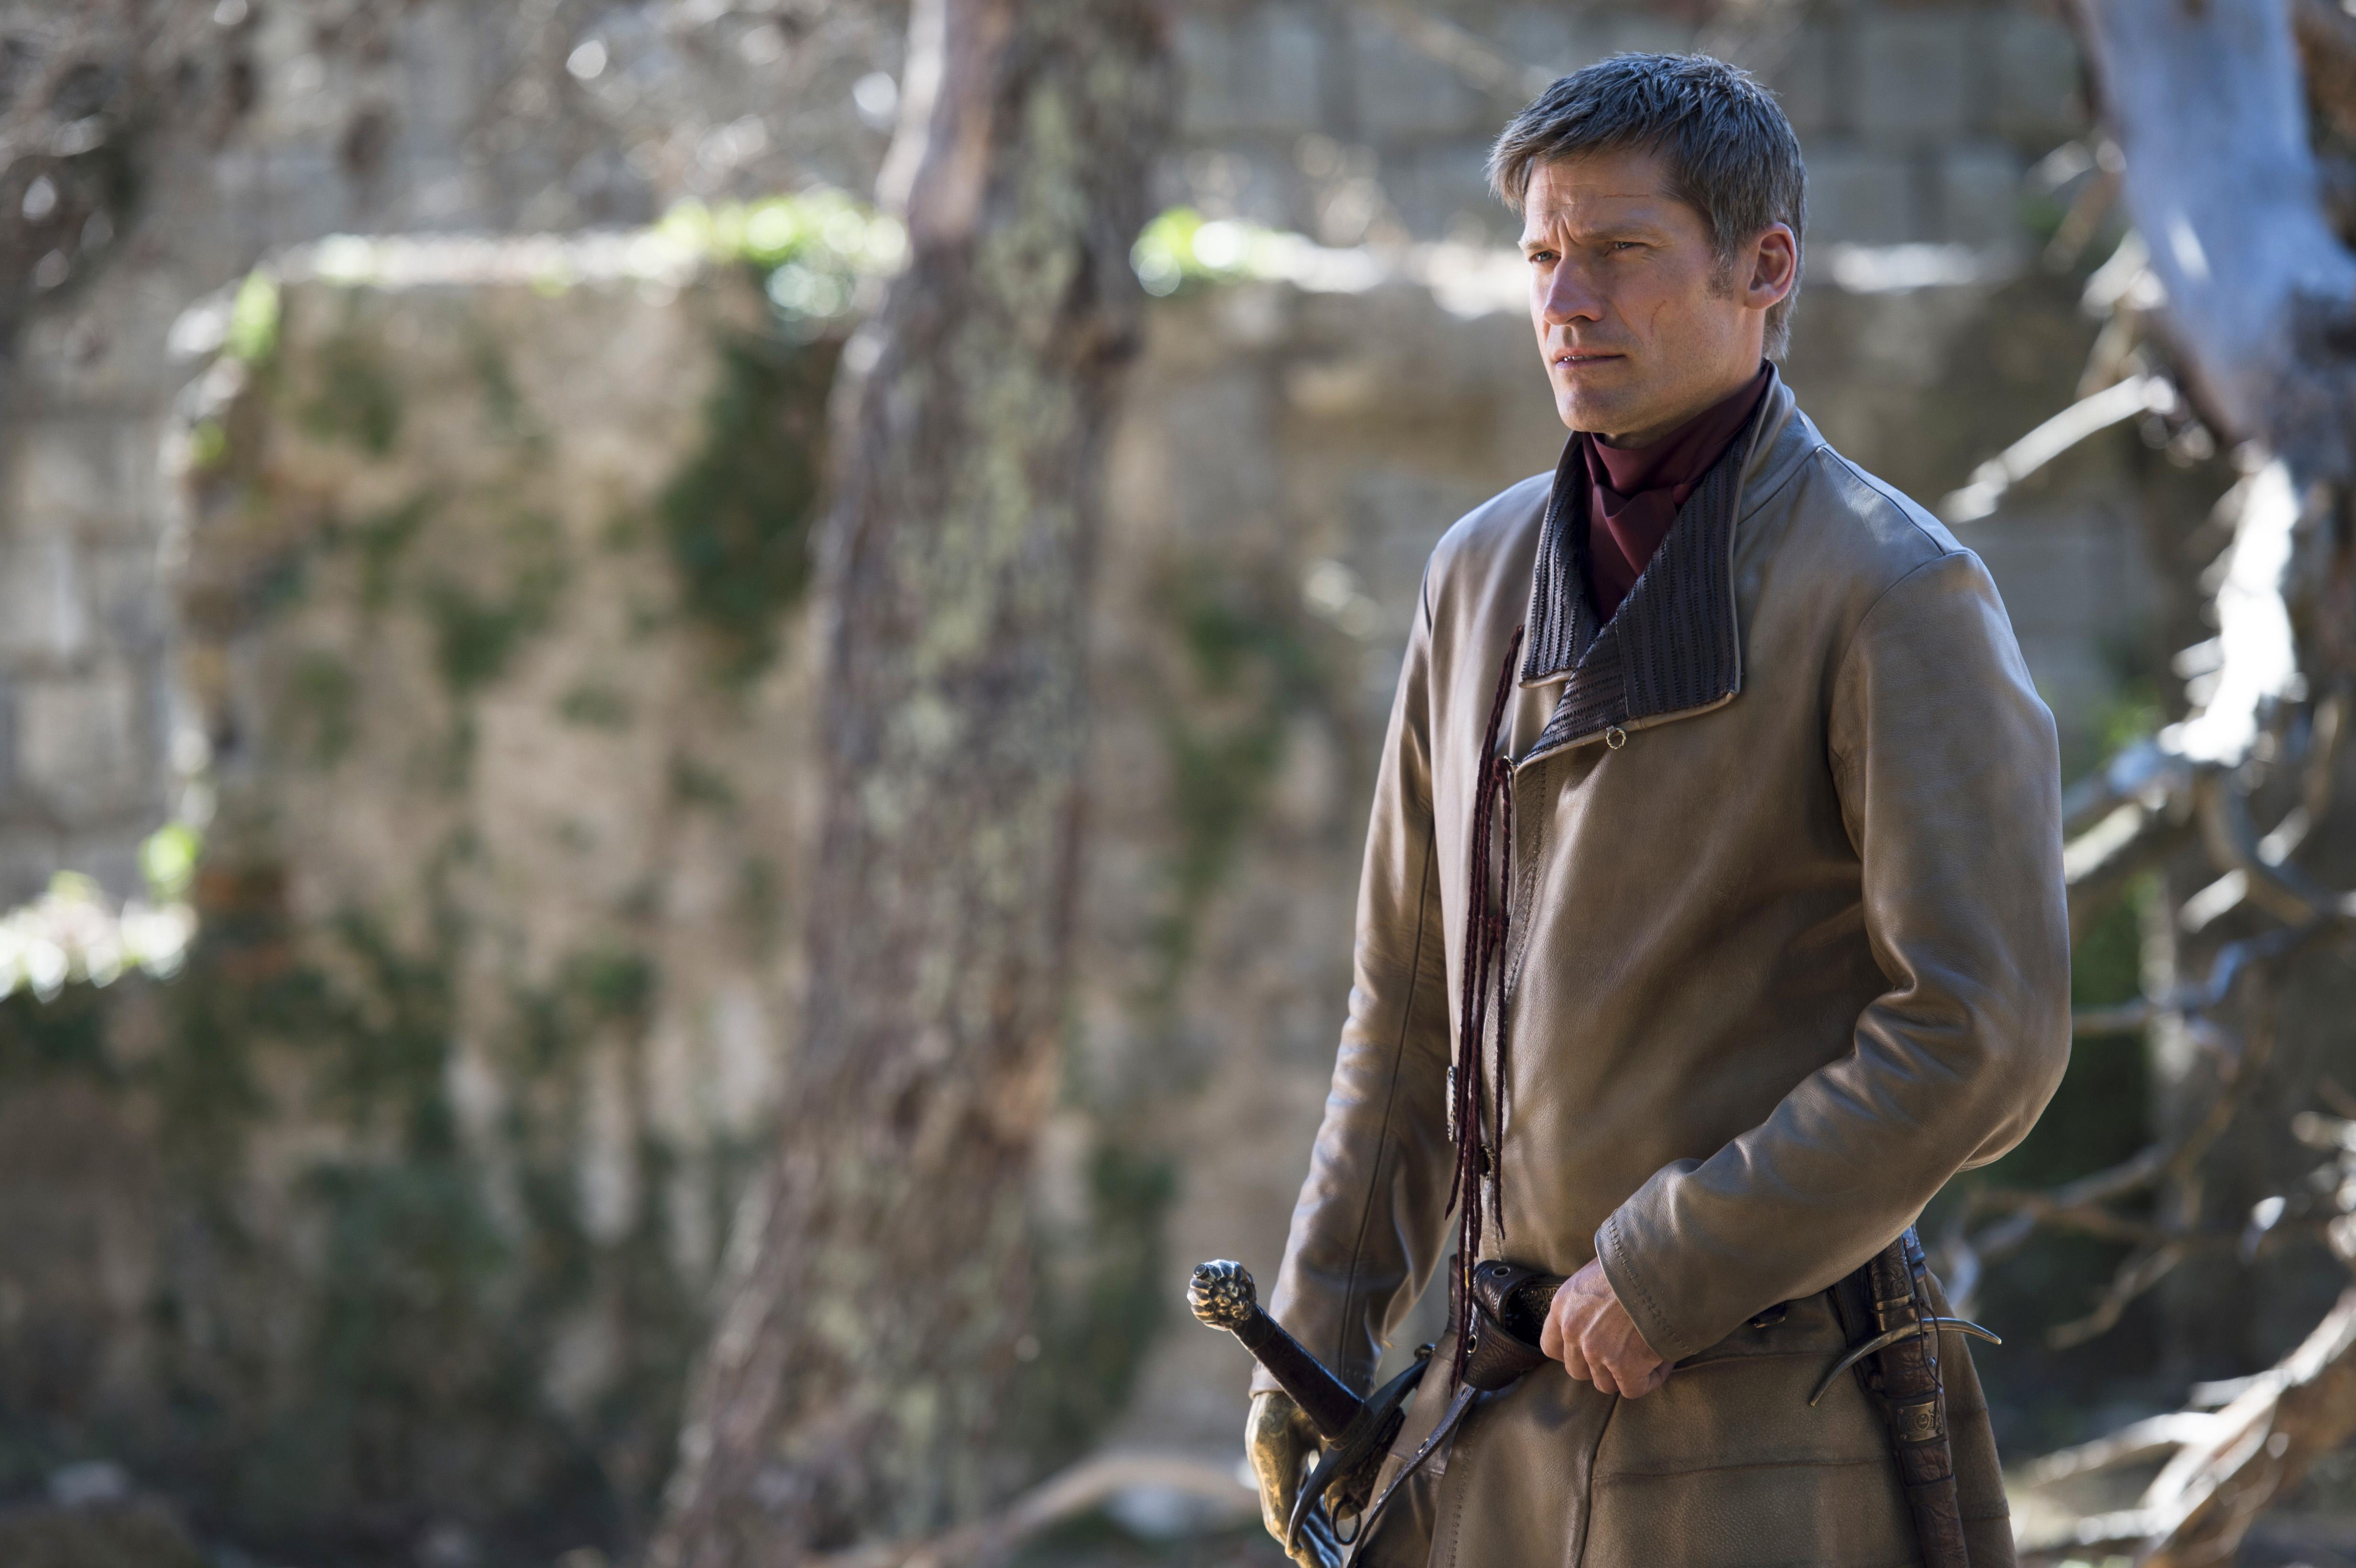 Jaime Lannister - Jaime Lannister Photo (36858909) - Fanpop